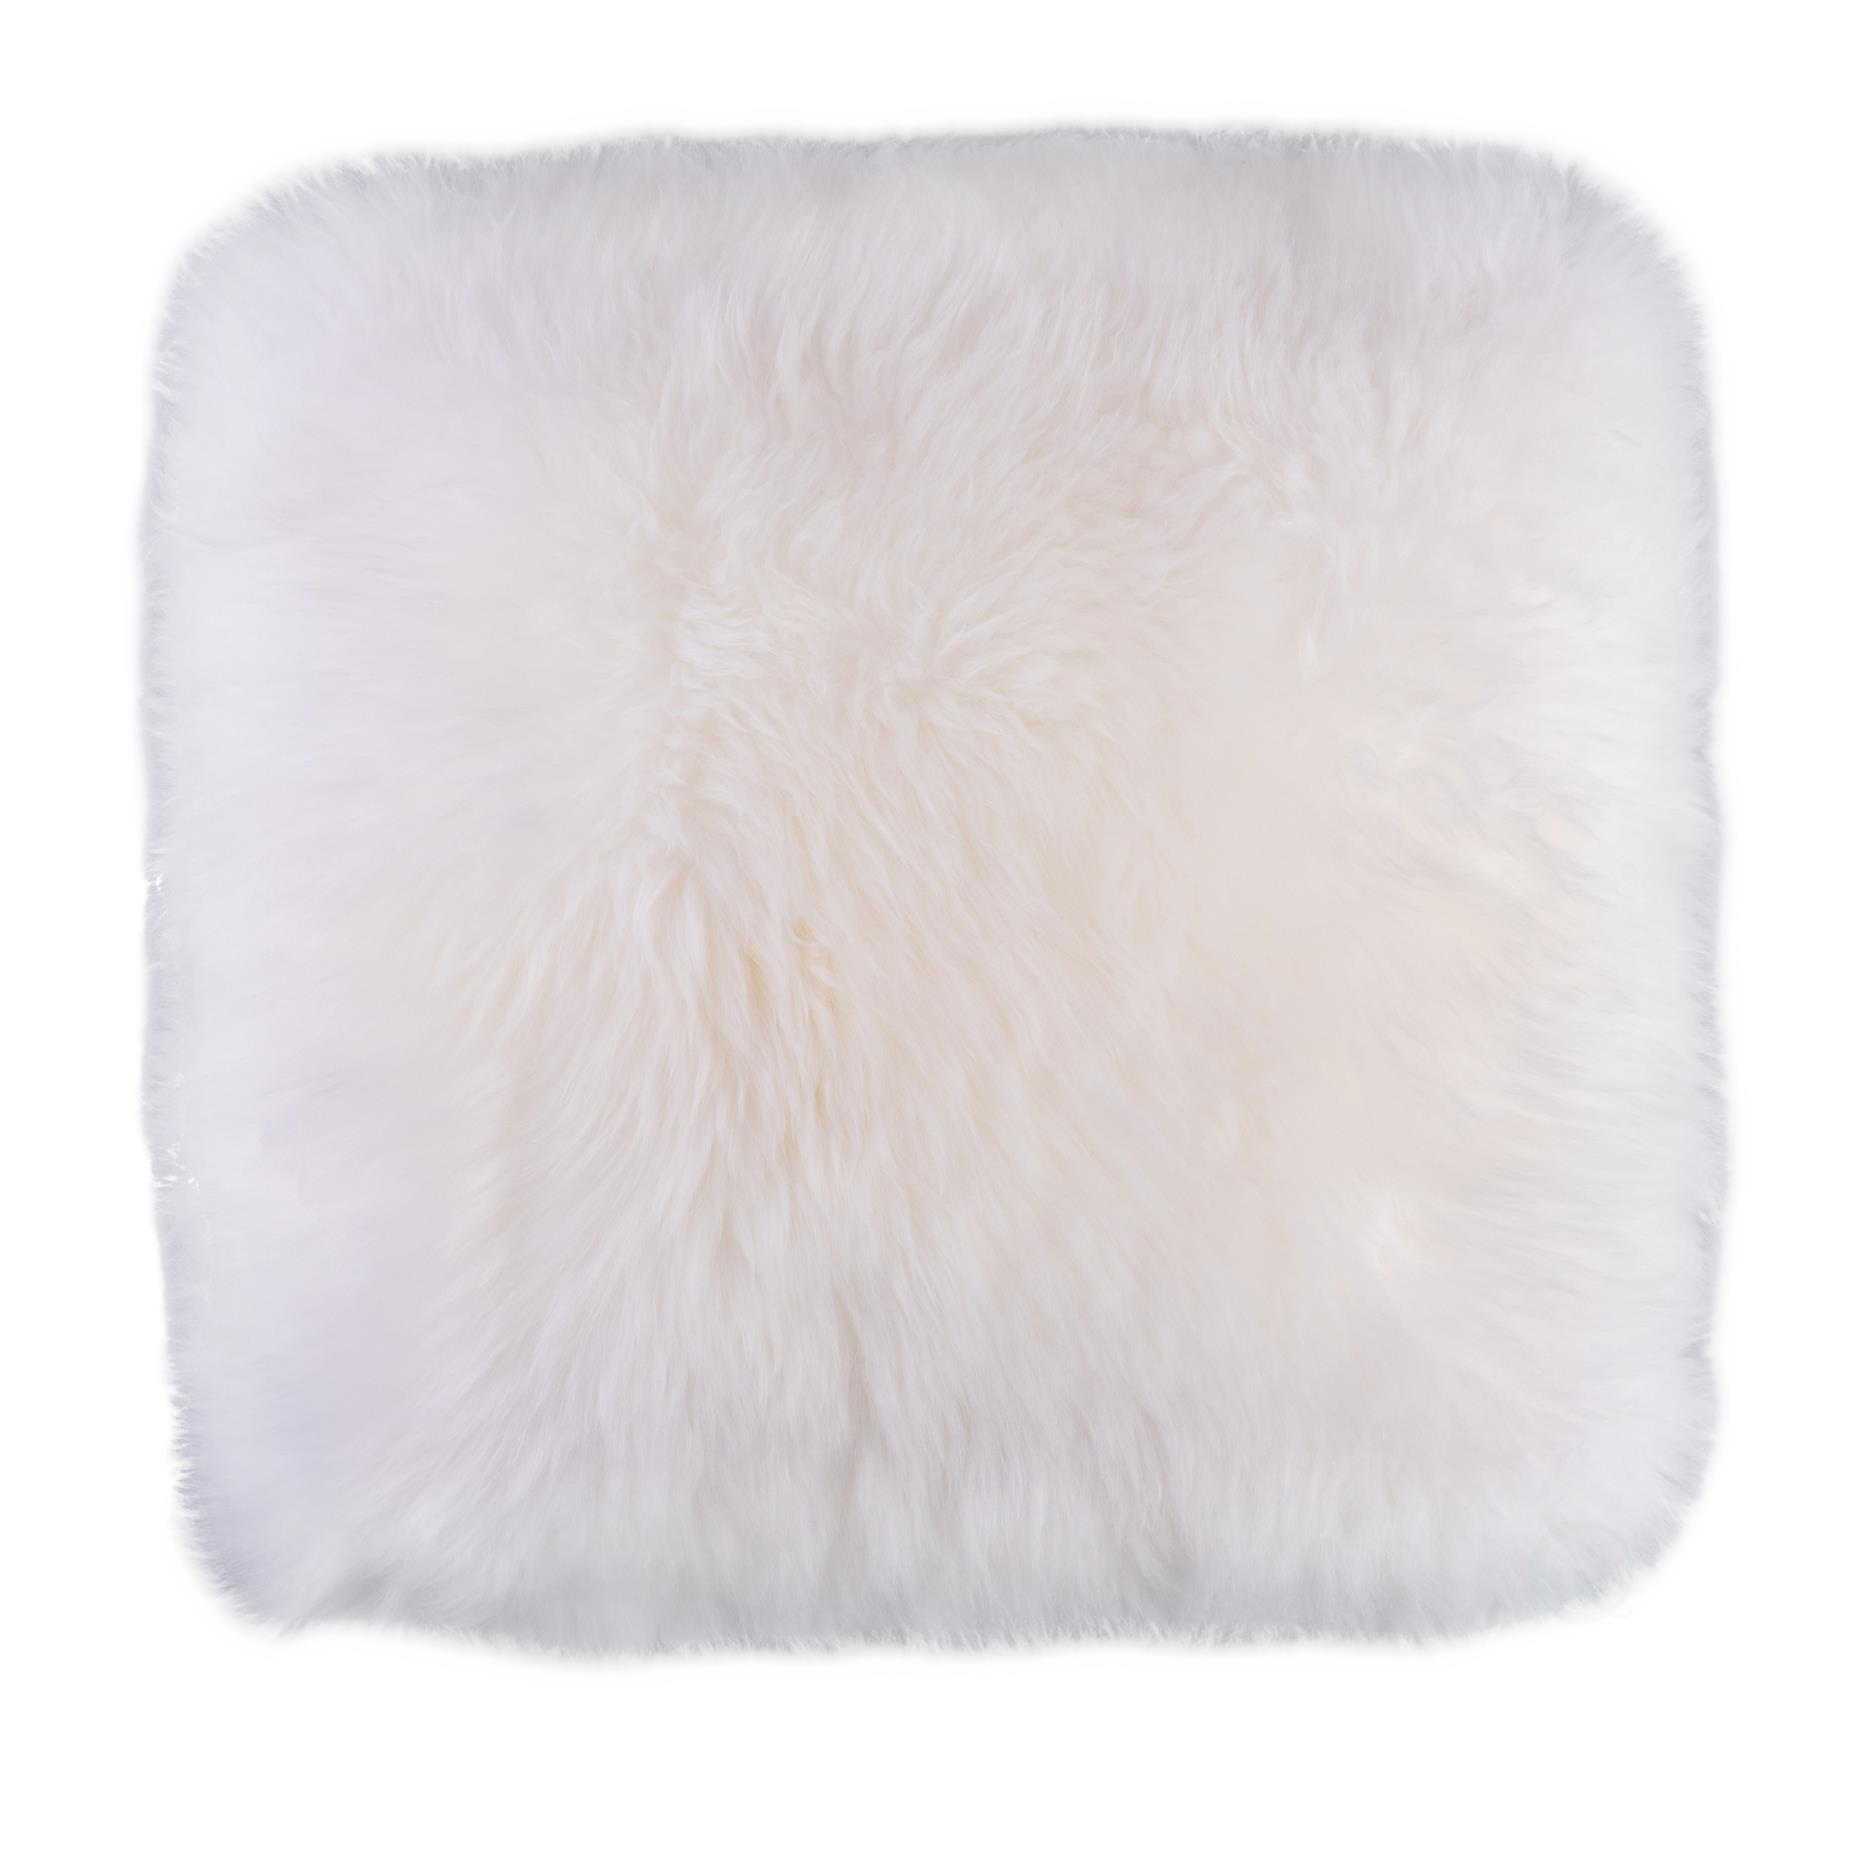 Genuine Australian Lamb Fur Sheepskin Square Pillow Cover 16 In White Walmart Com Walmart Com